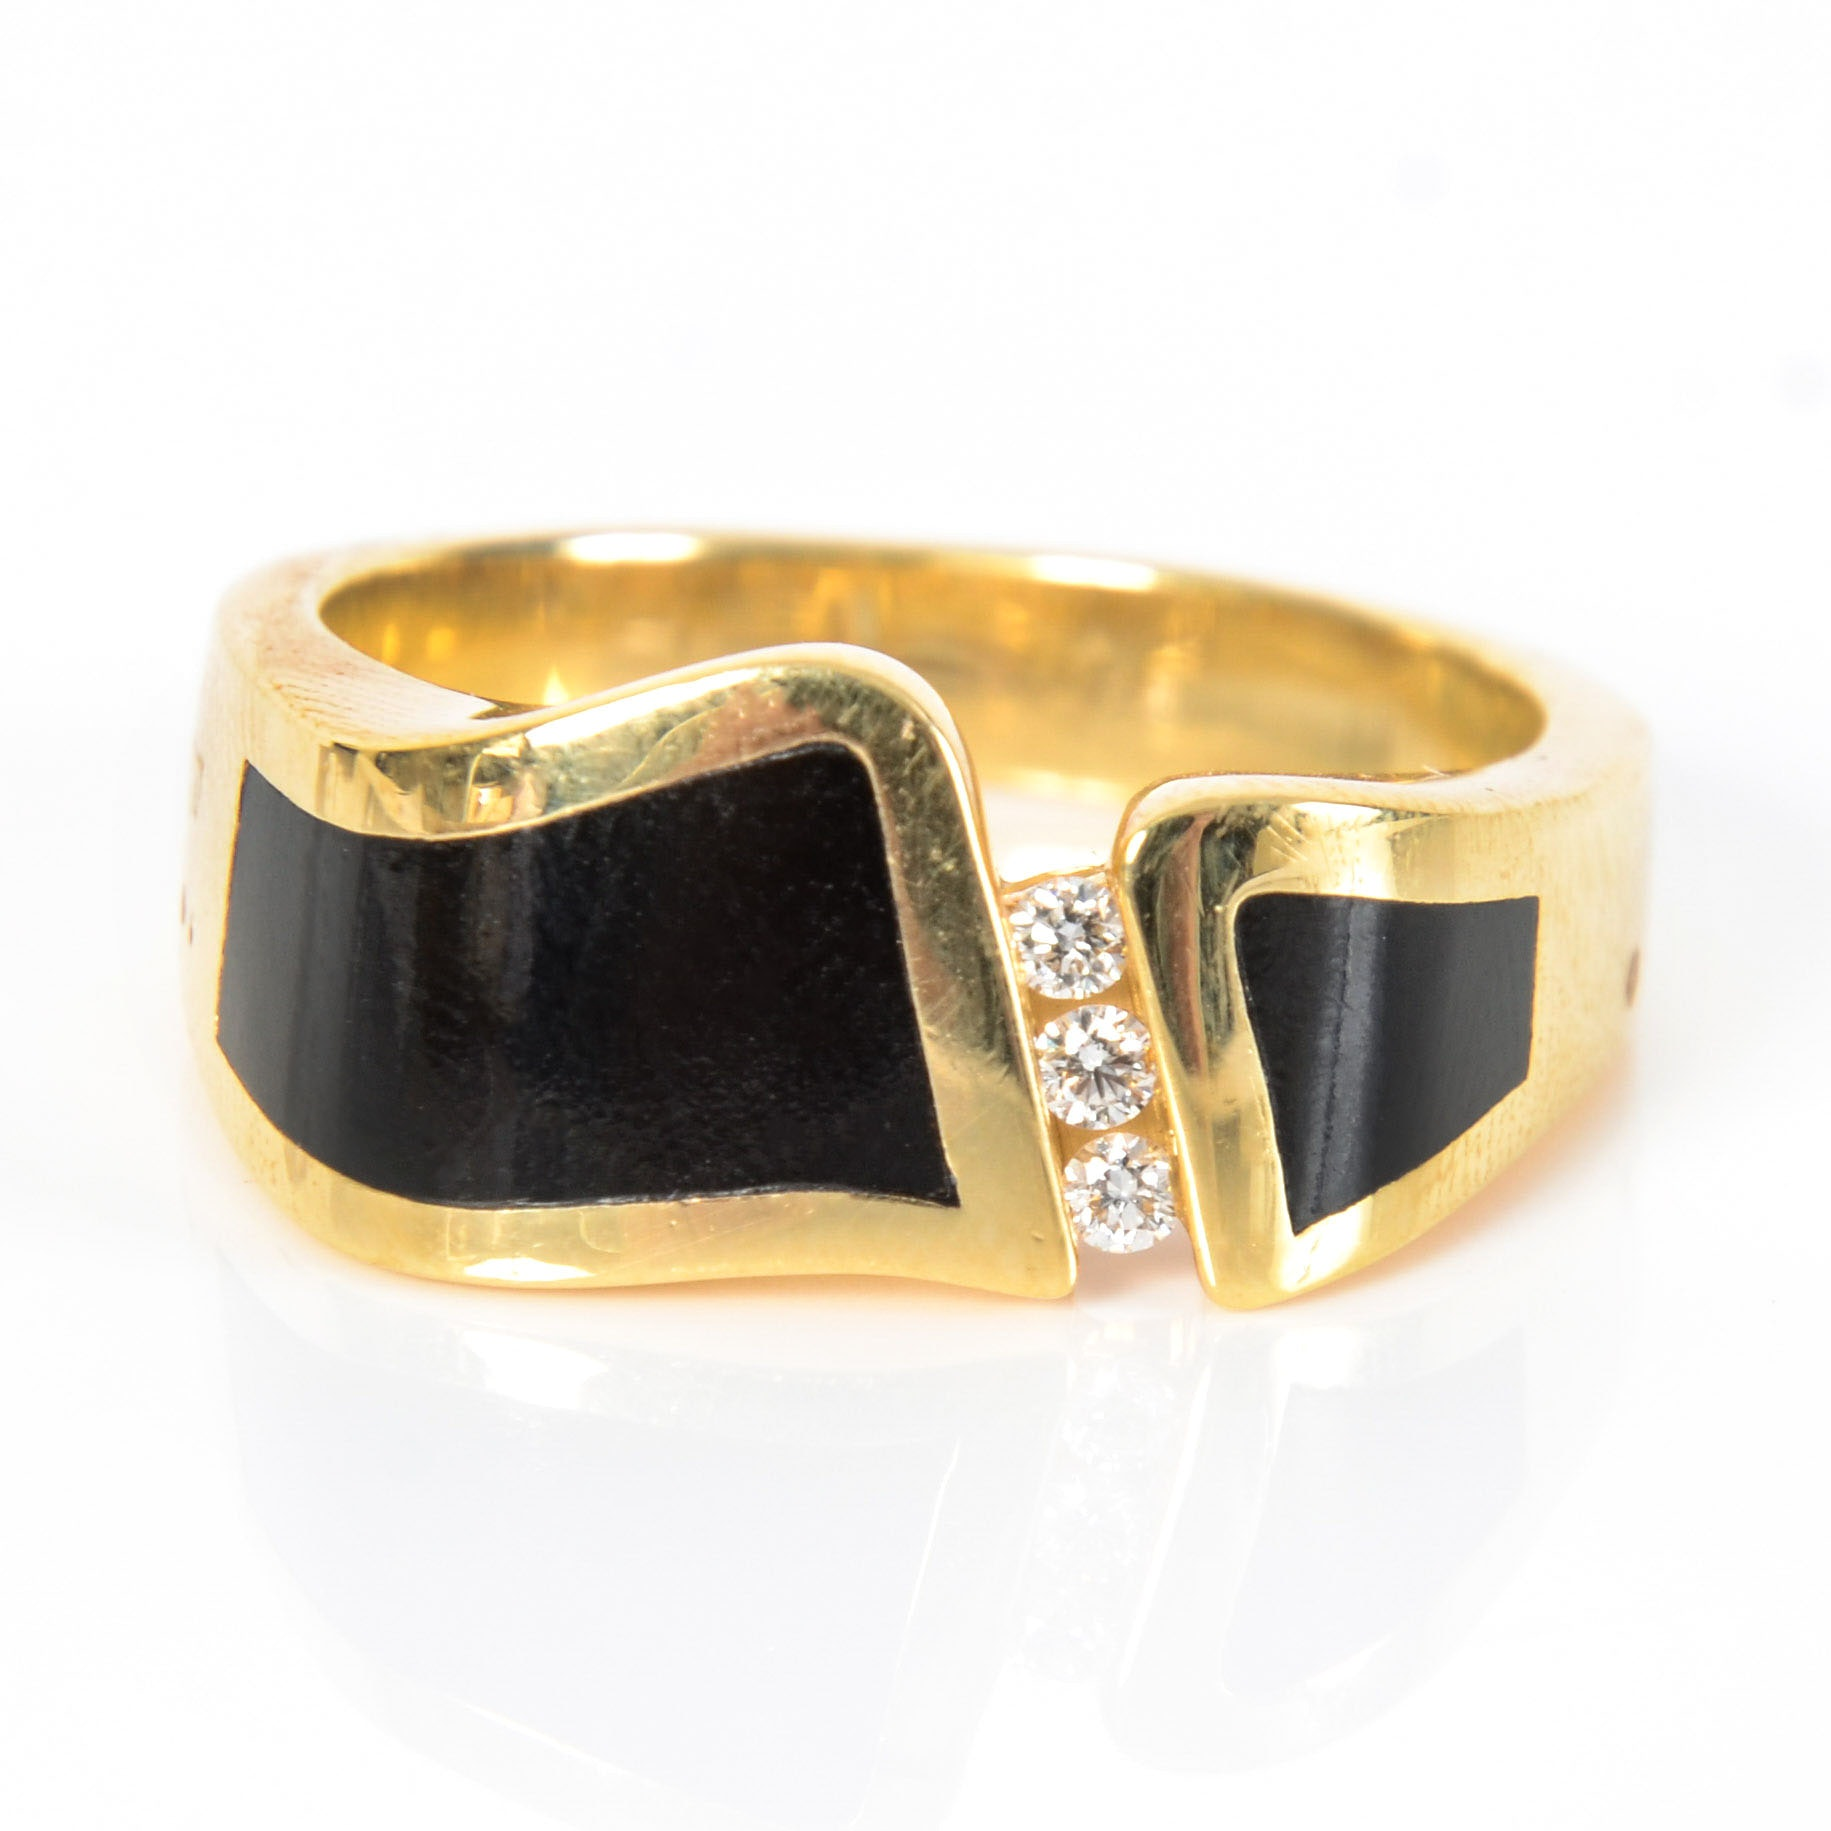 Bernard K Passman 18K  Gold Ring with Black Coral and Diamonds